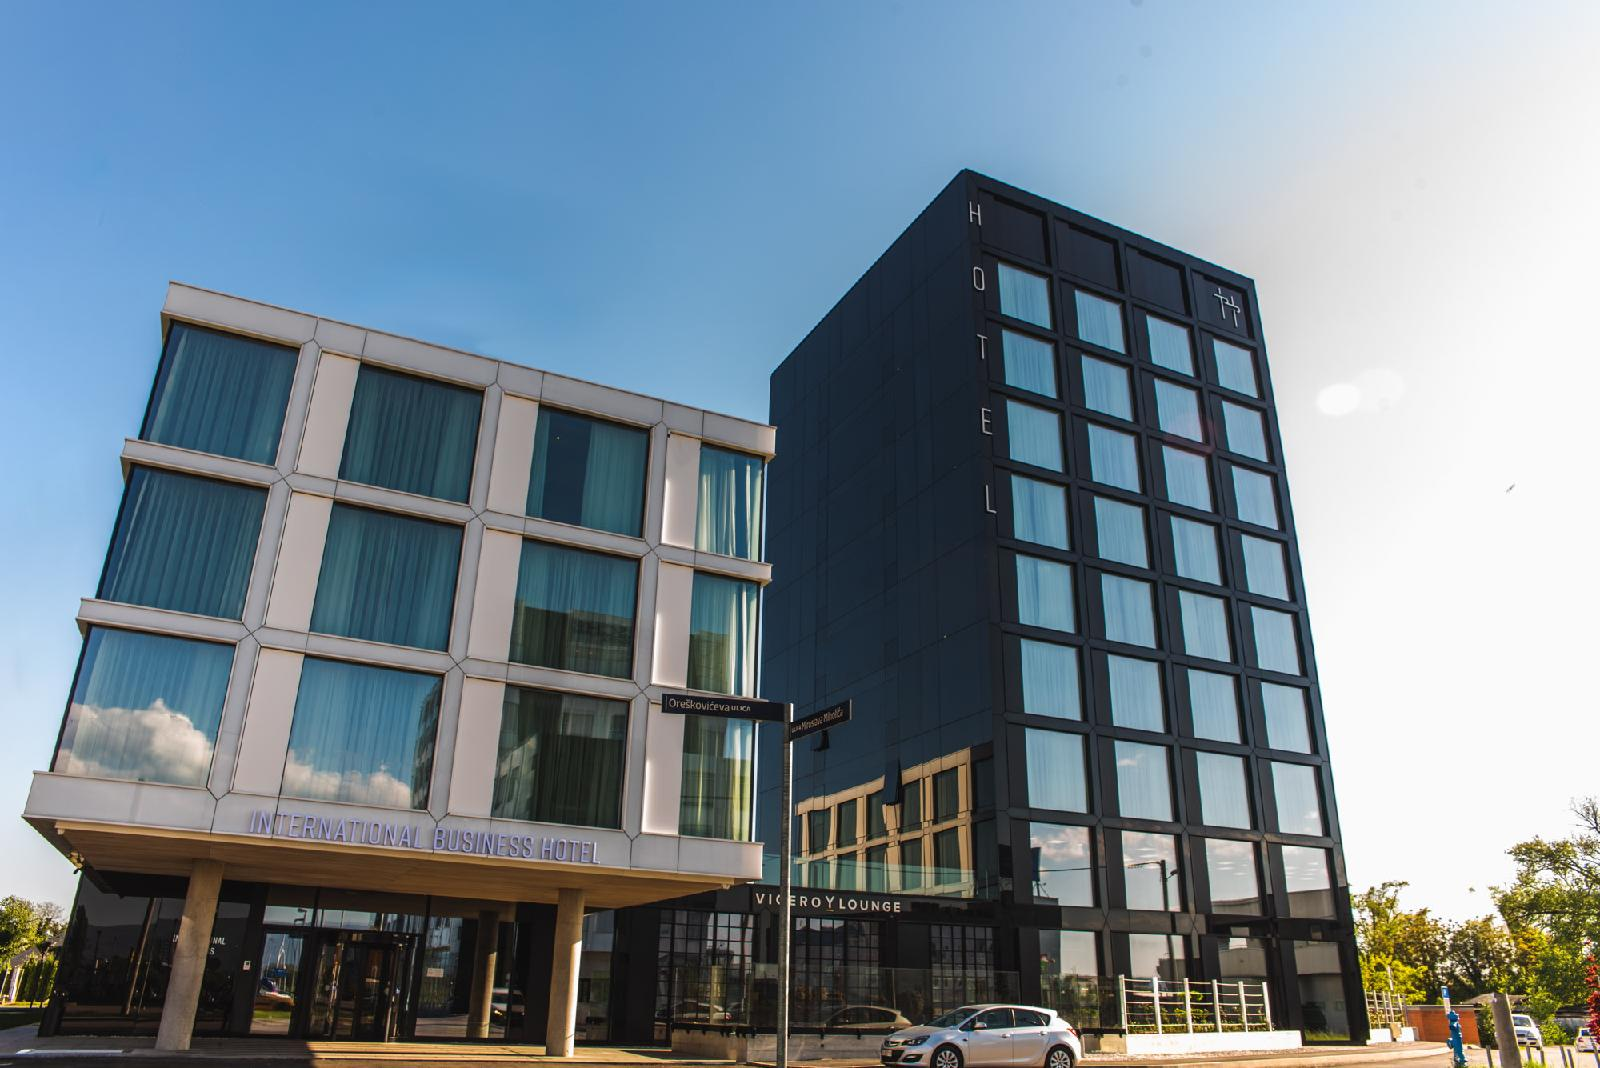 International Business Hotel Image 6